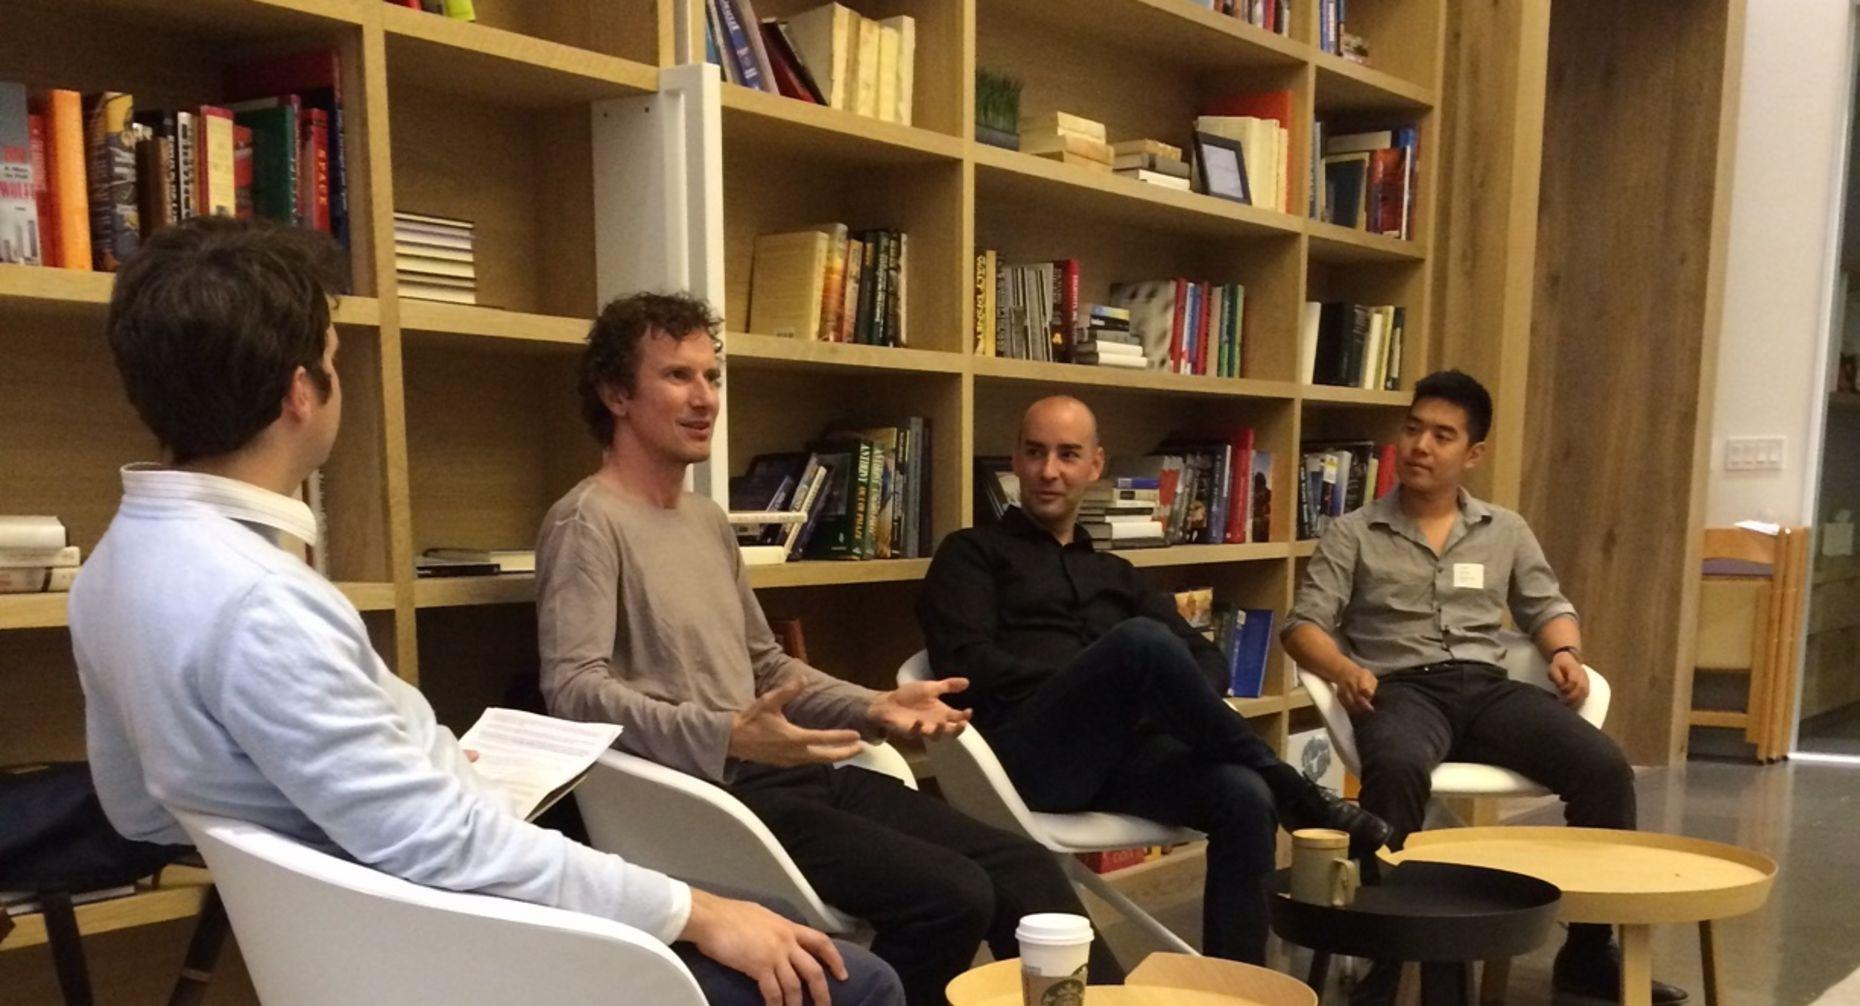 Left to right, Amir Efrati, Luke Nosek, Mark Palatucci and Paul Duan.